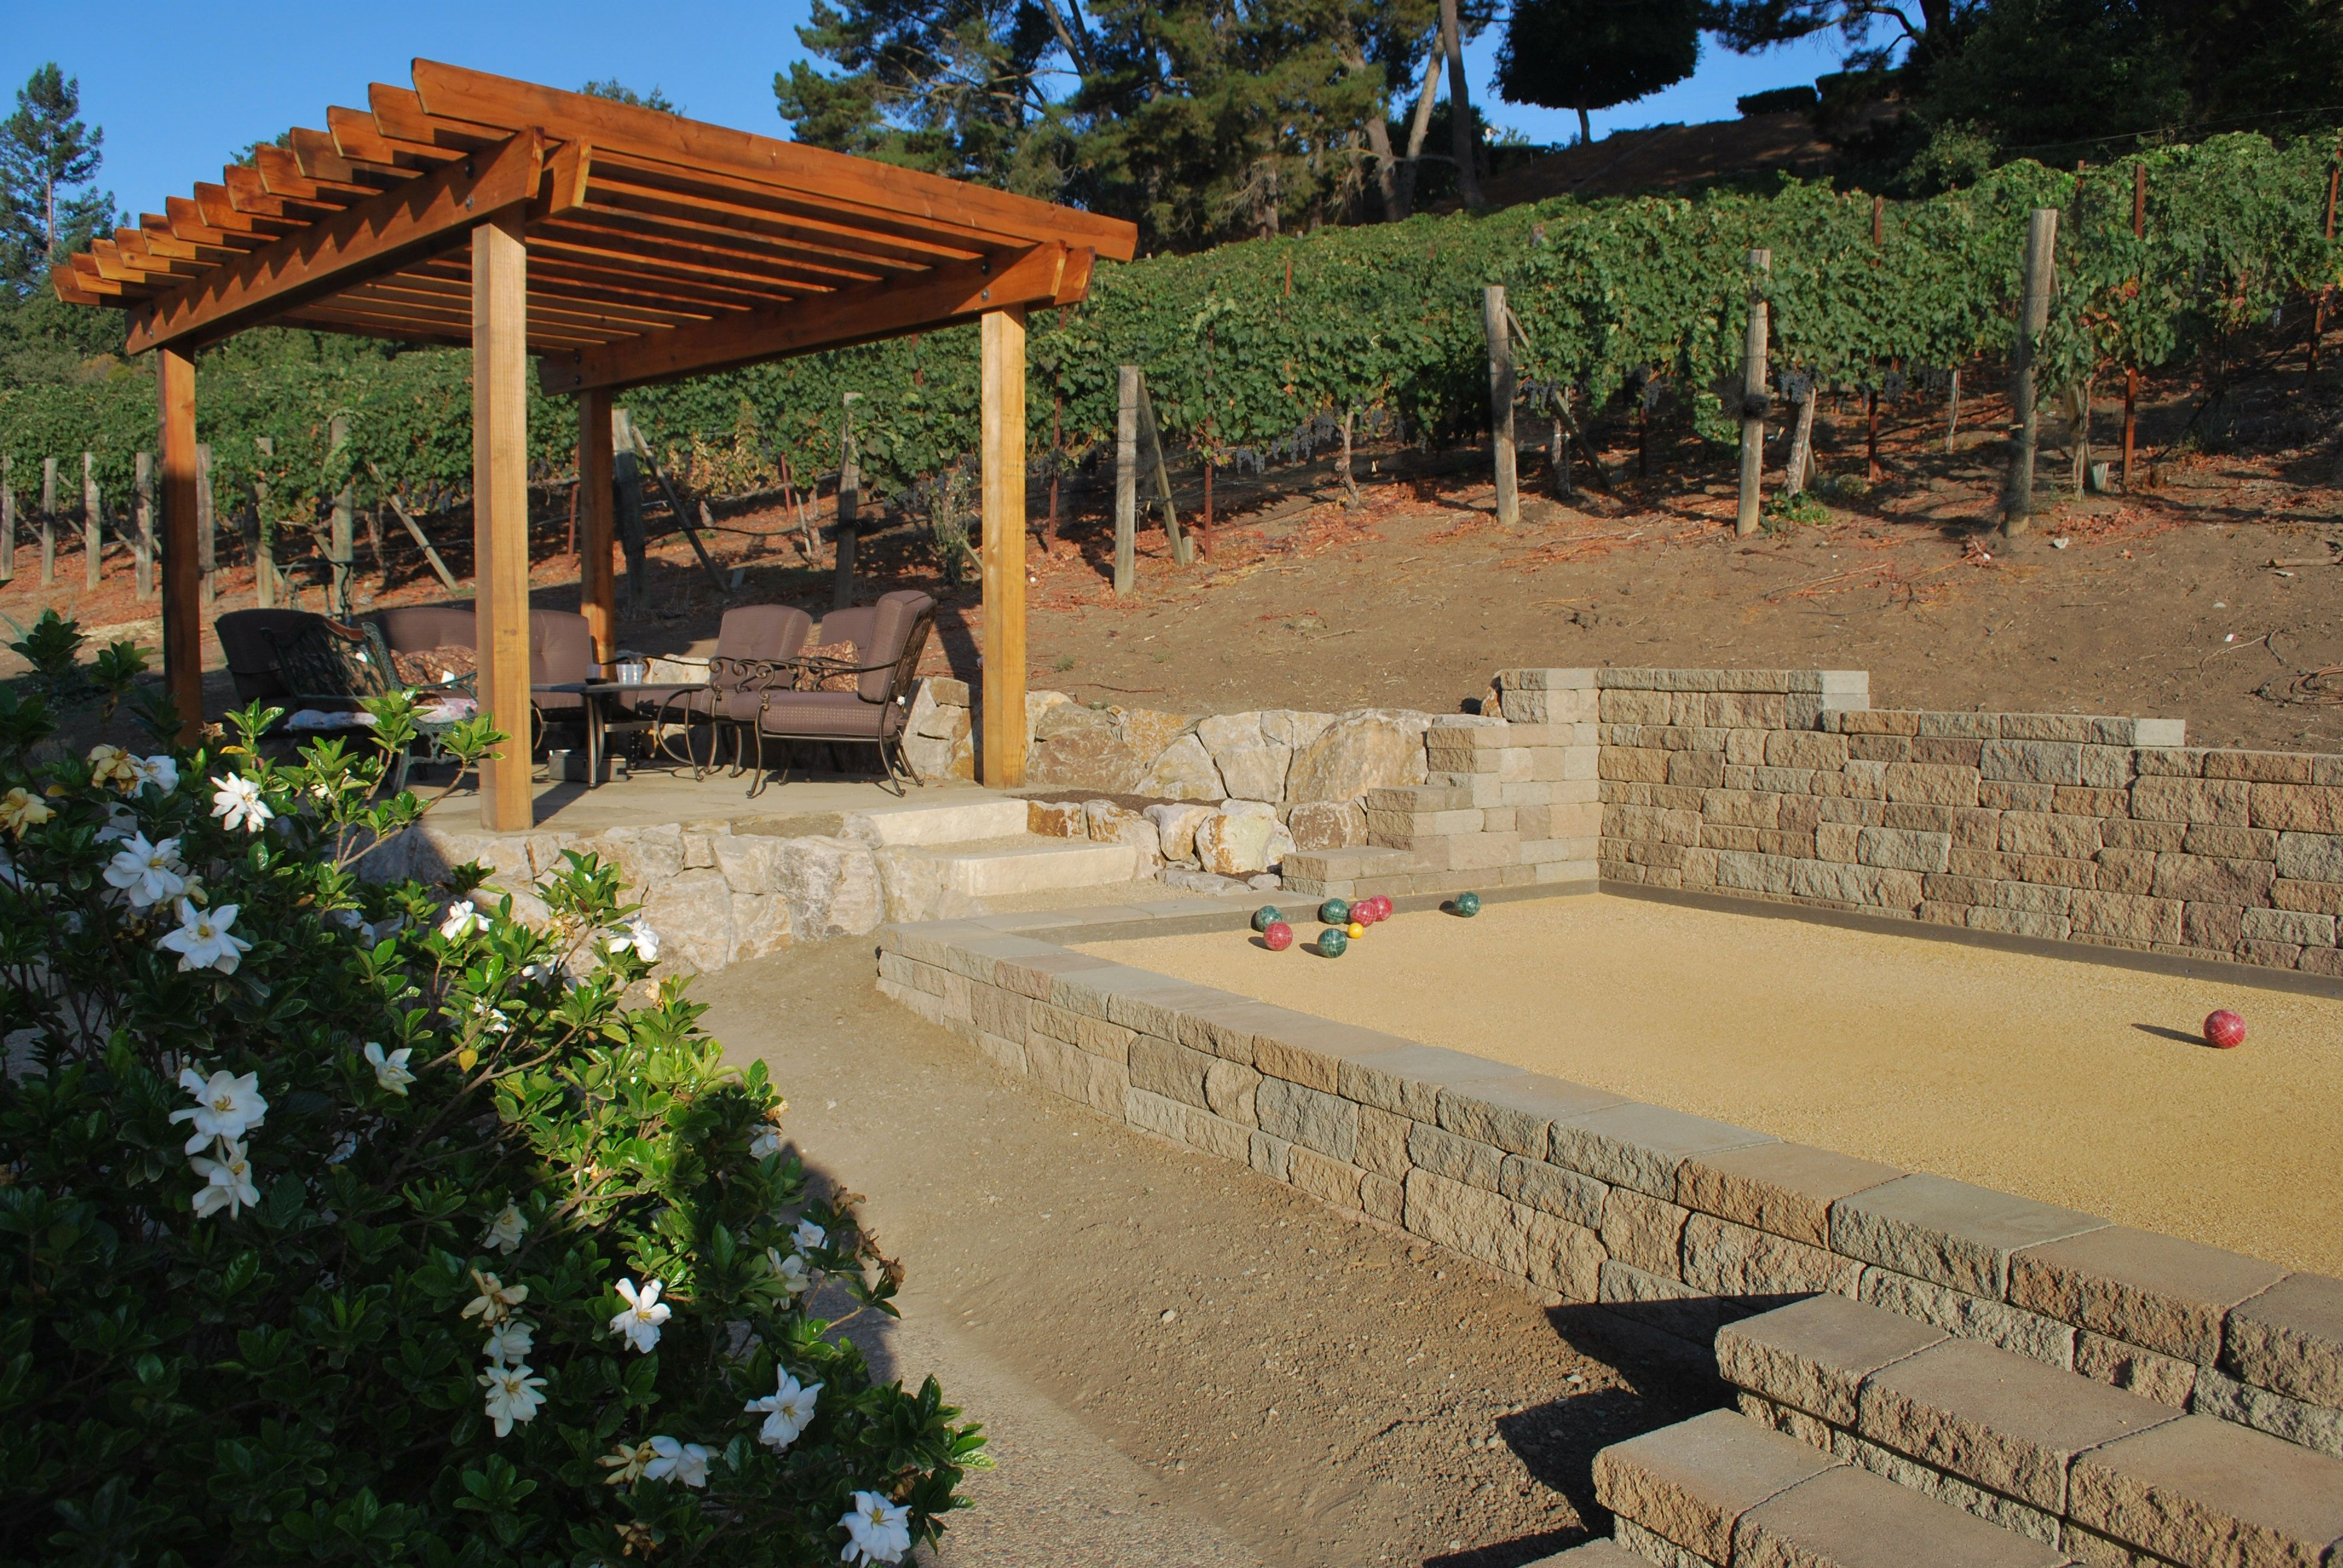 bocce ball court backyard - Google Search   Bocce court ...